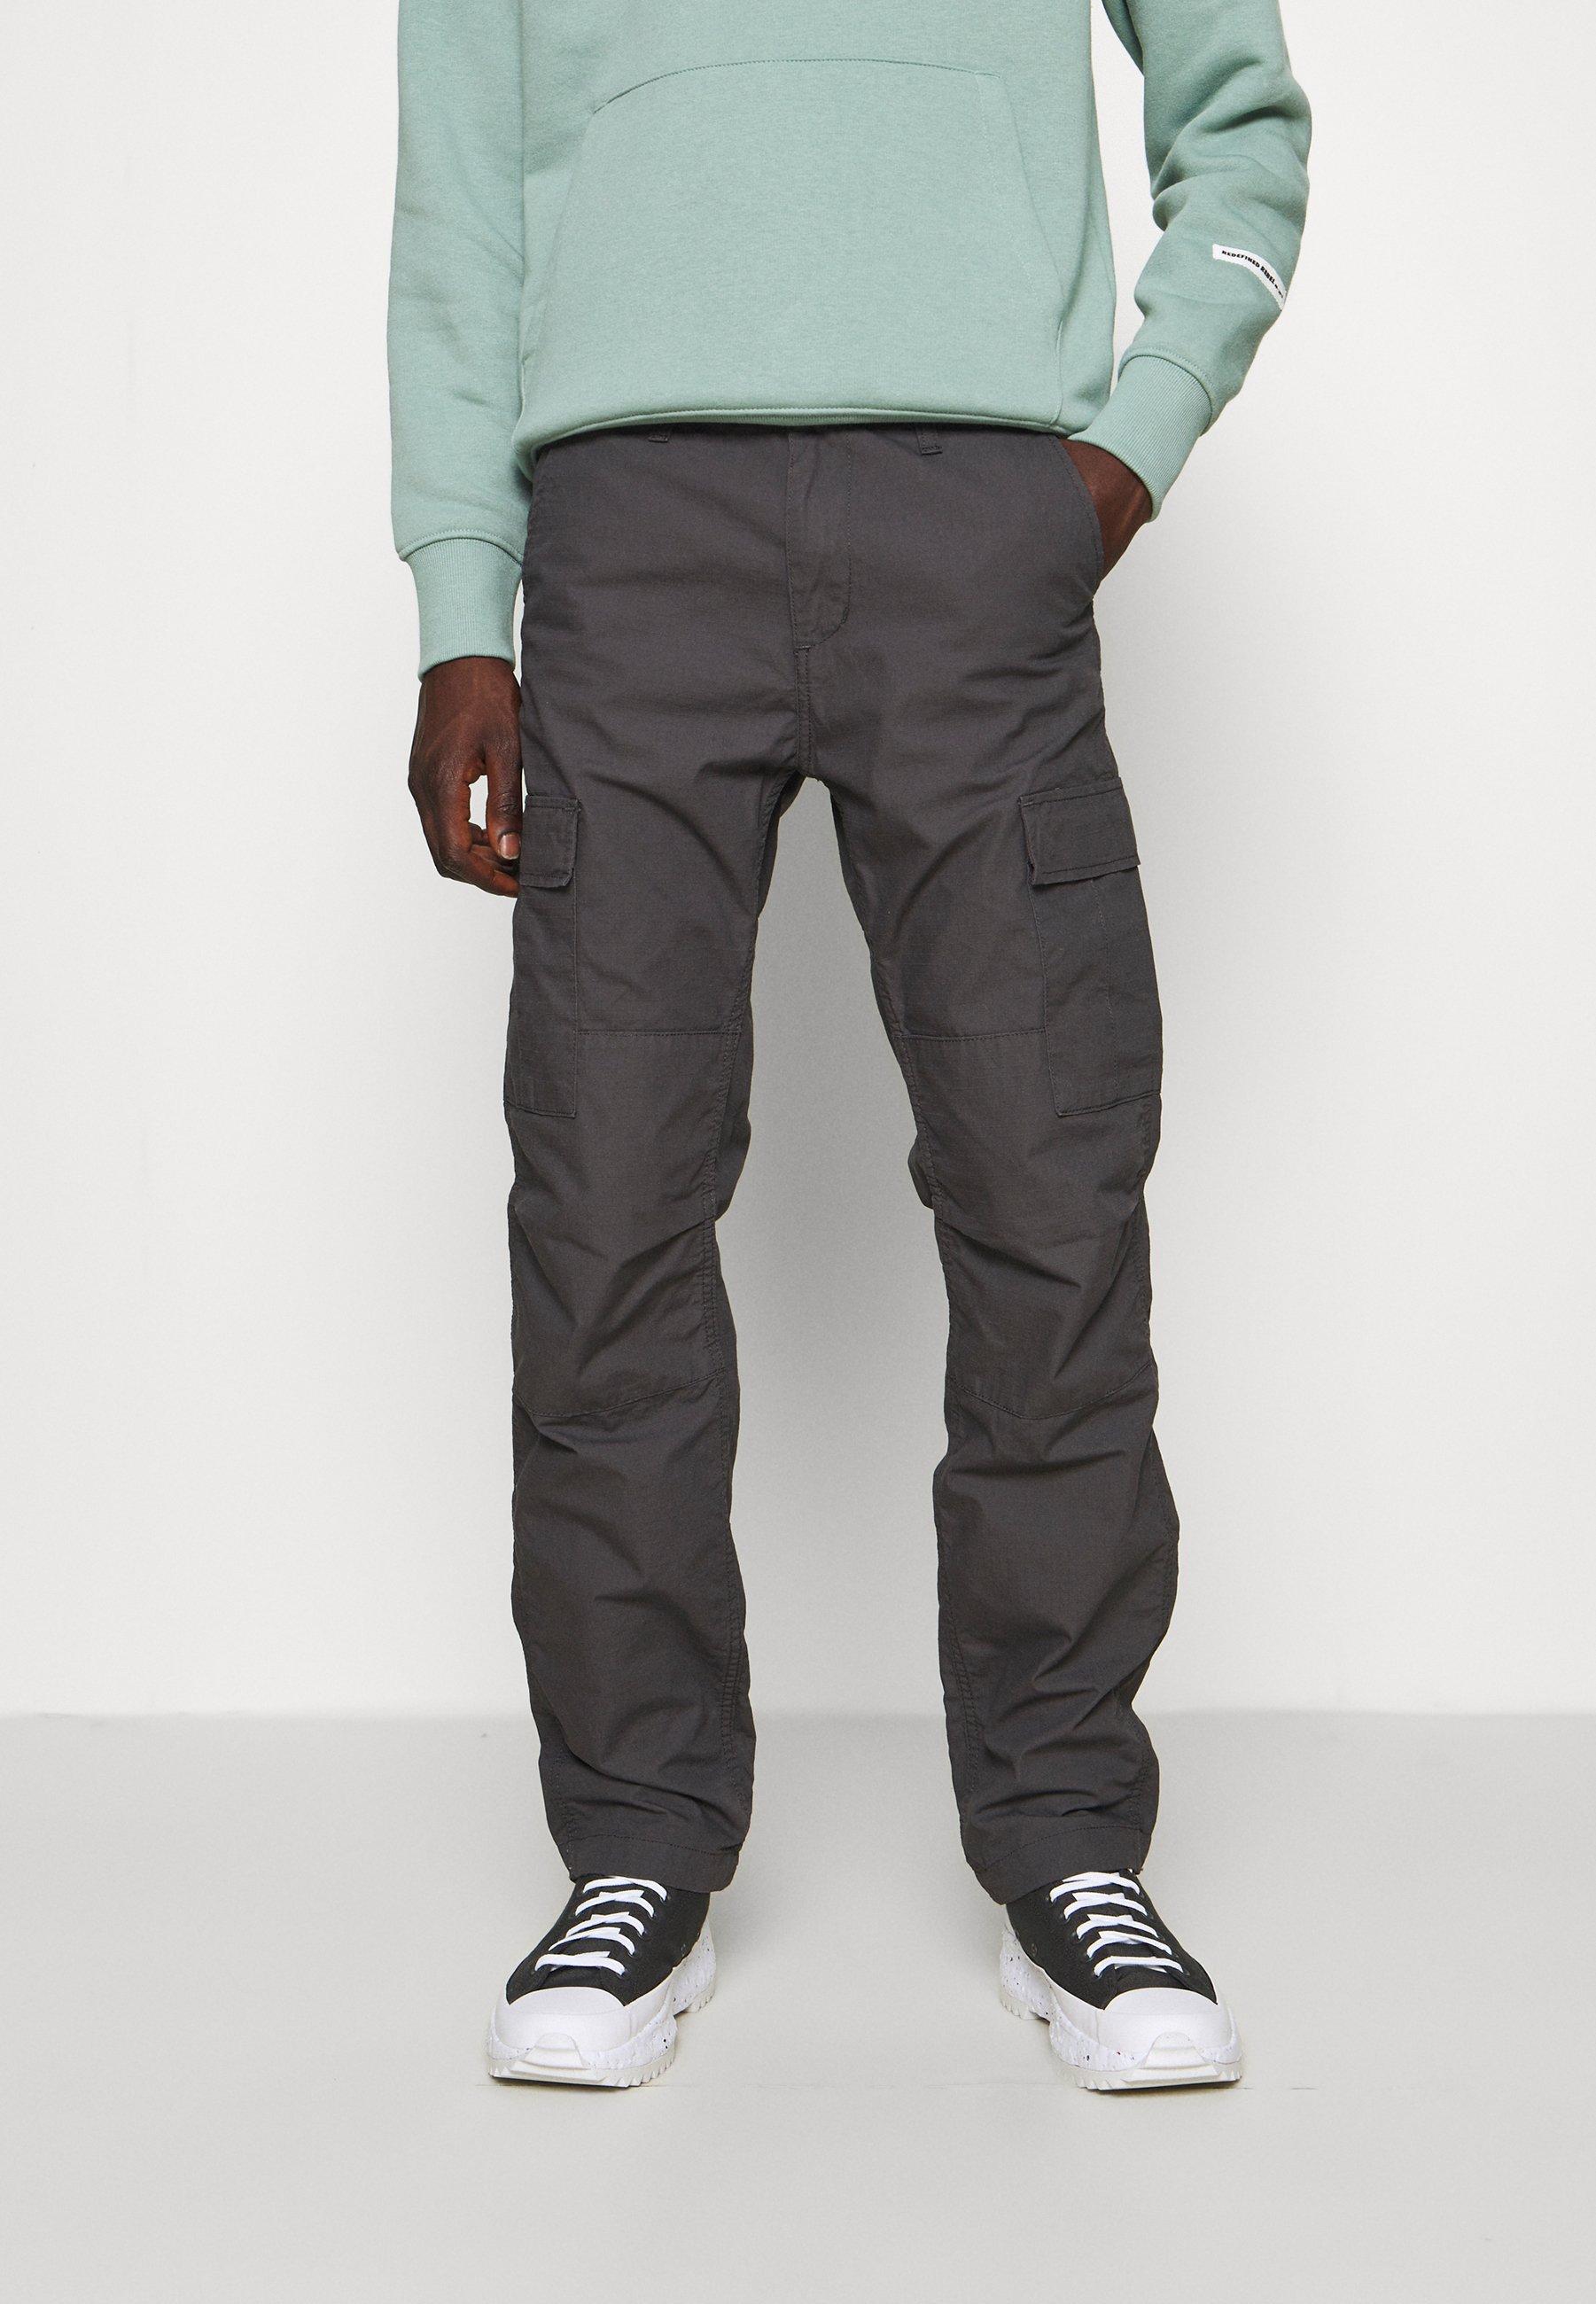 Homme AVIATION PANT COLUMBIA - Pantalon cargo